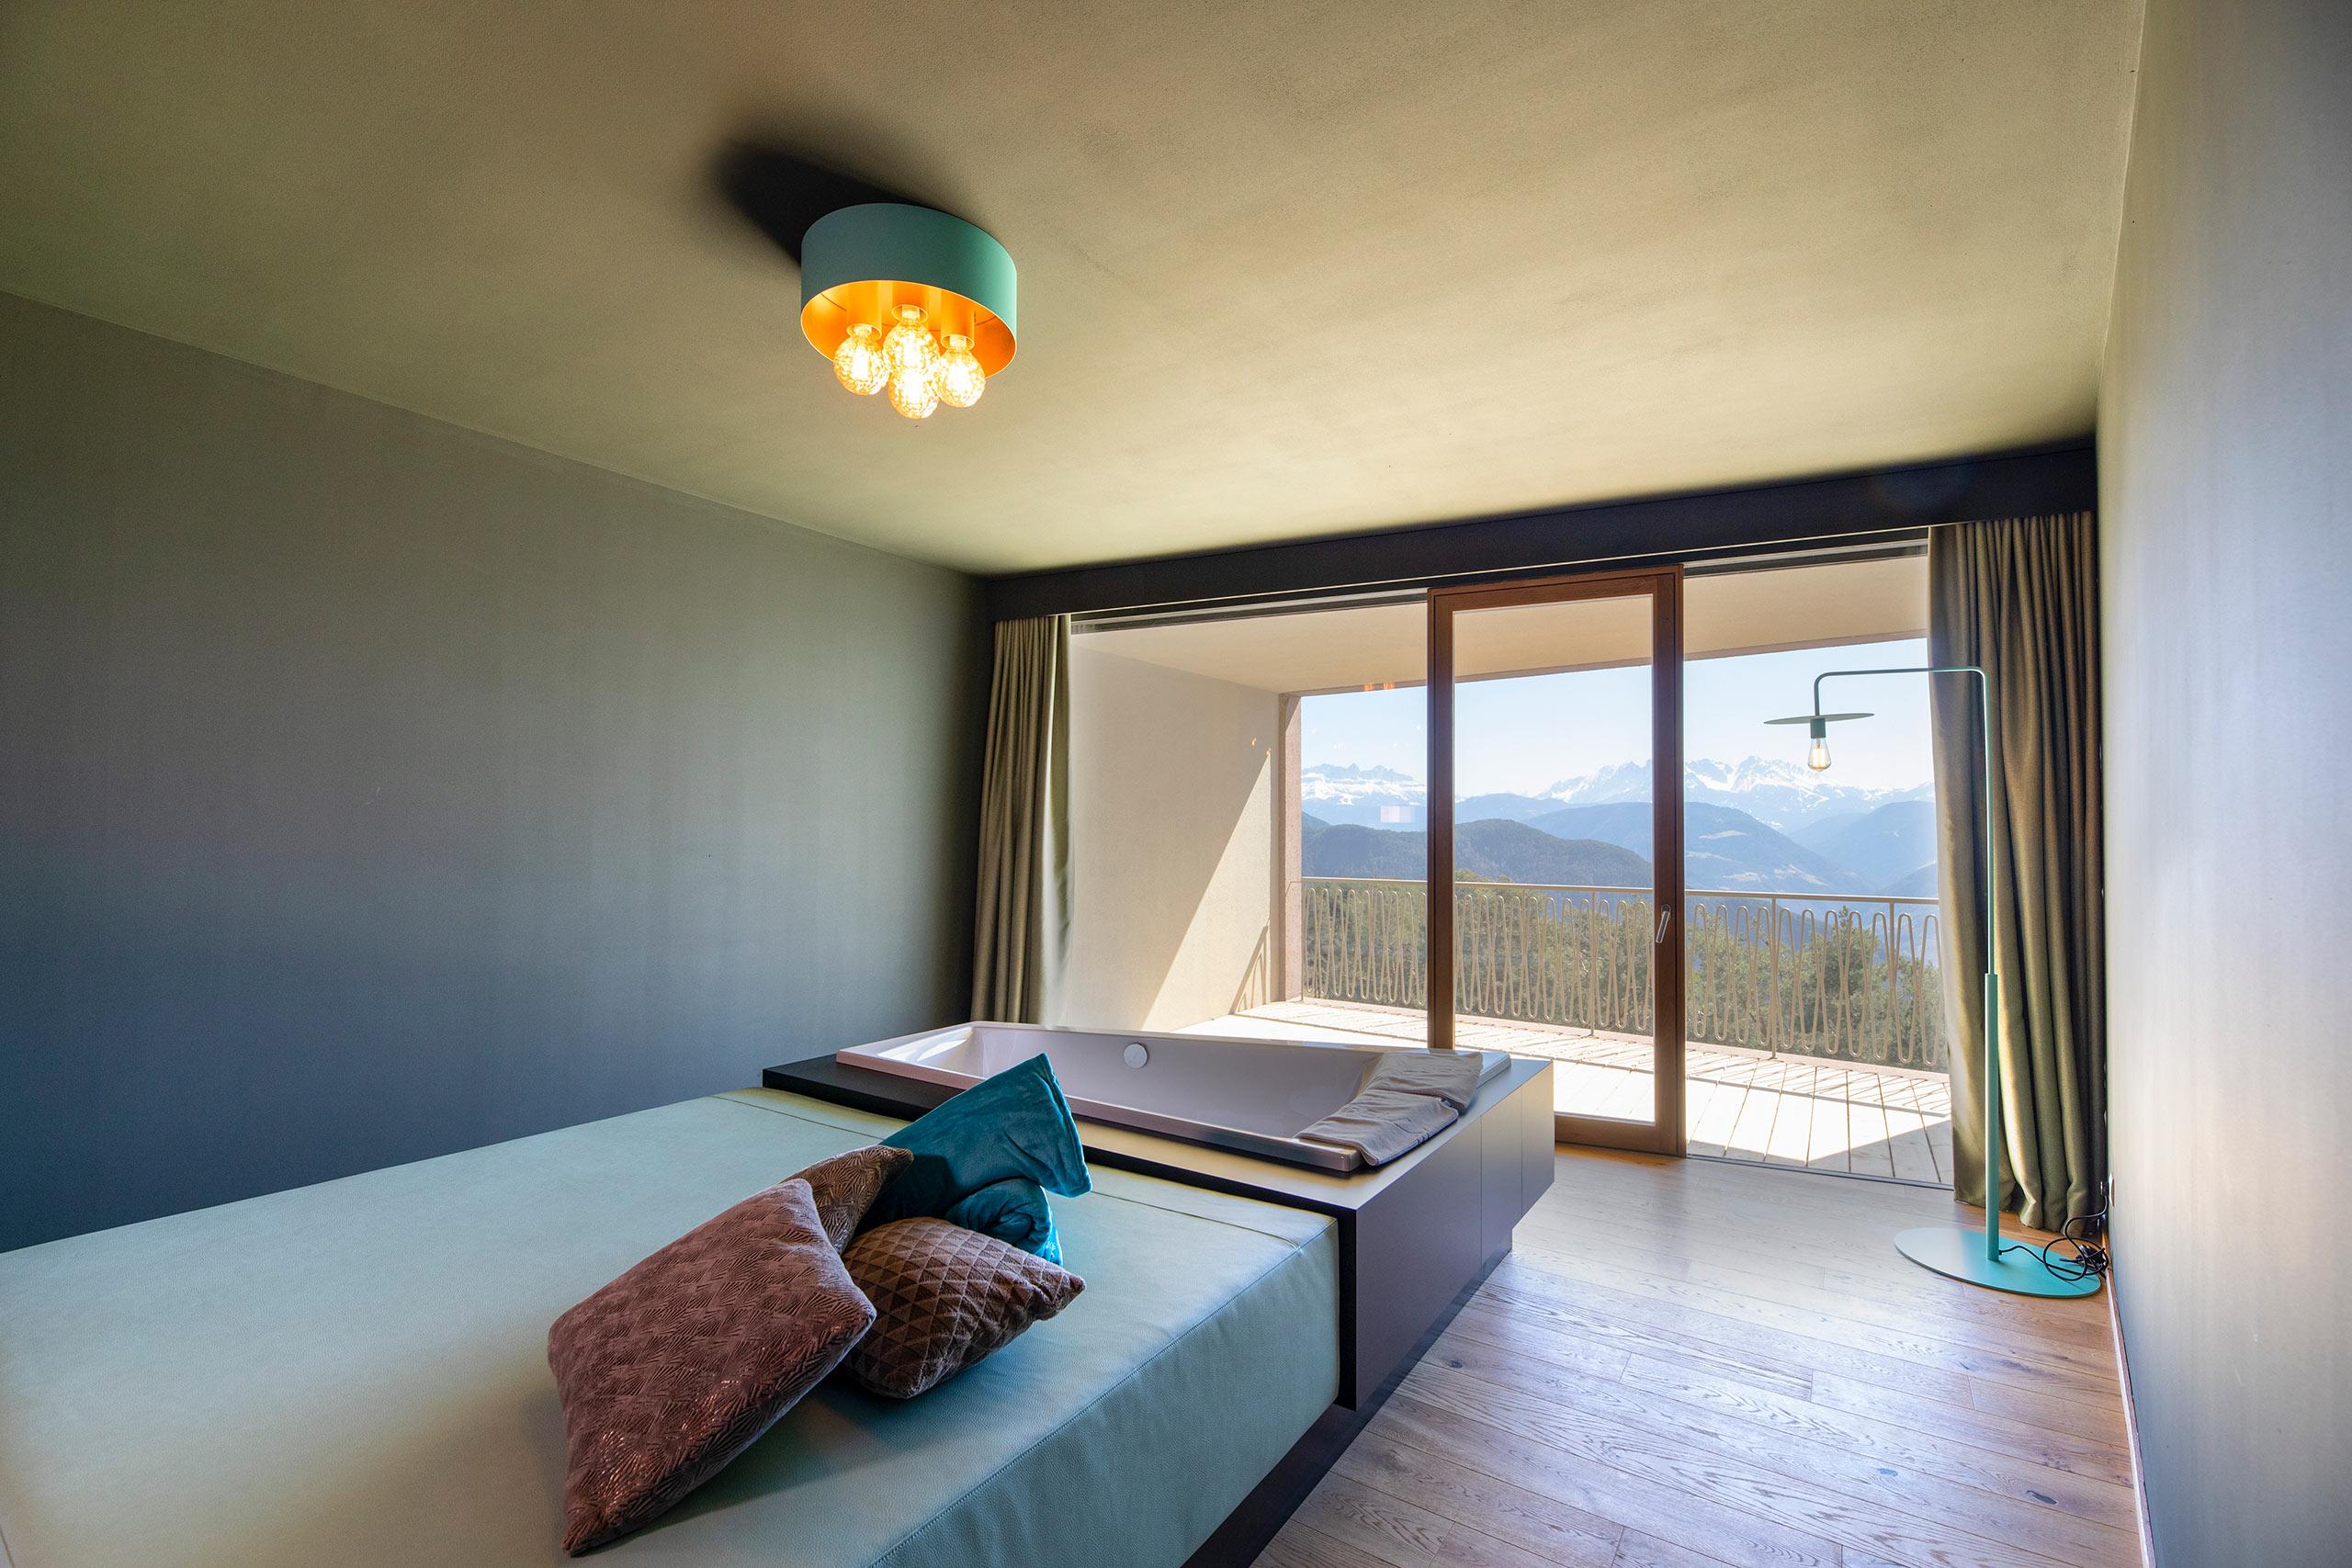 hotel_belvedere_jenesien_referenz_16